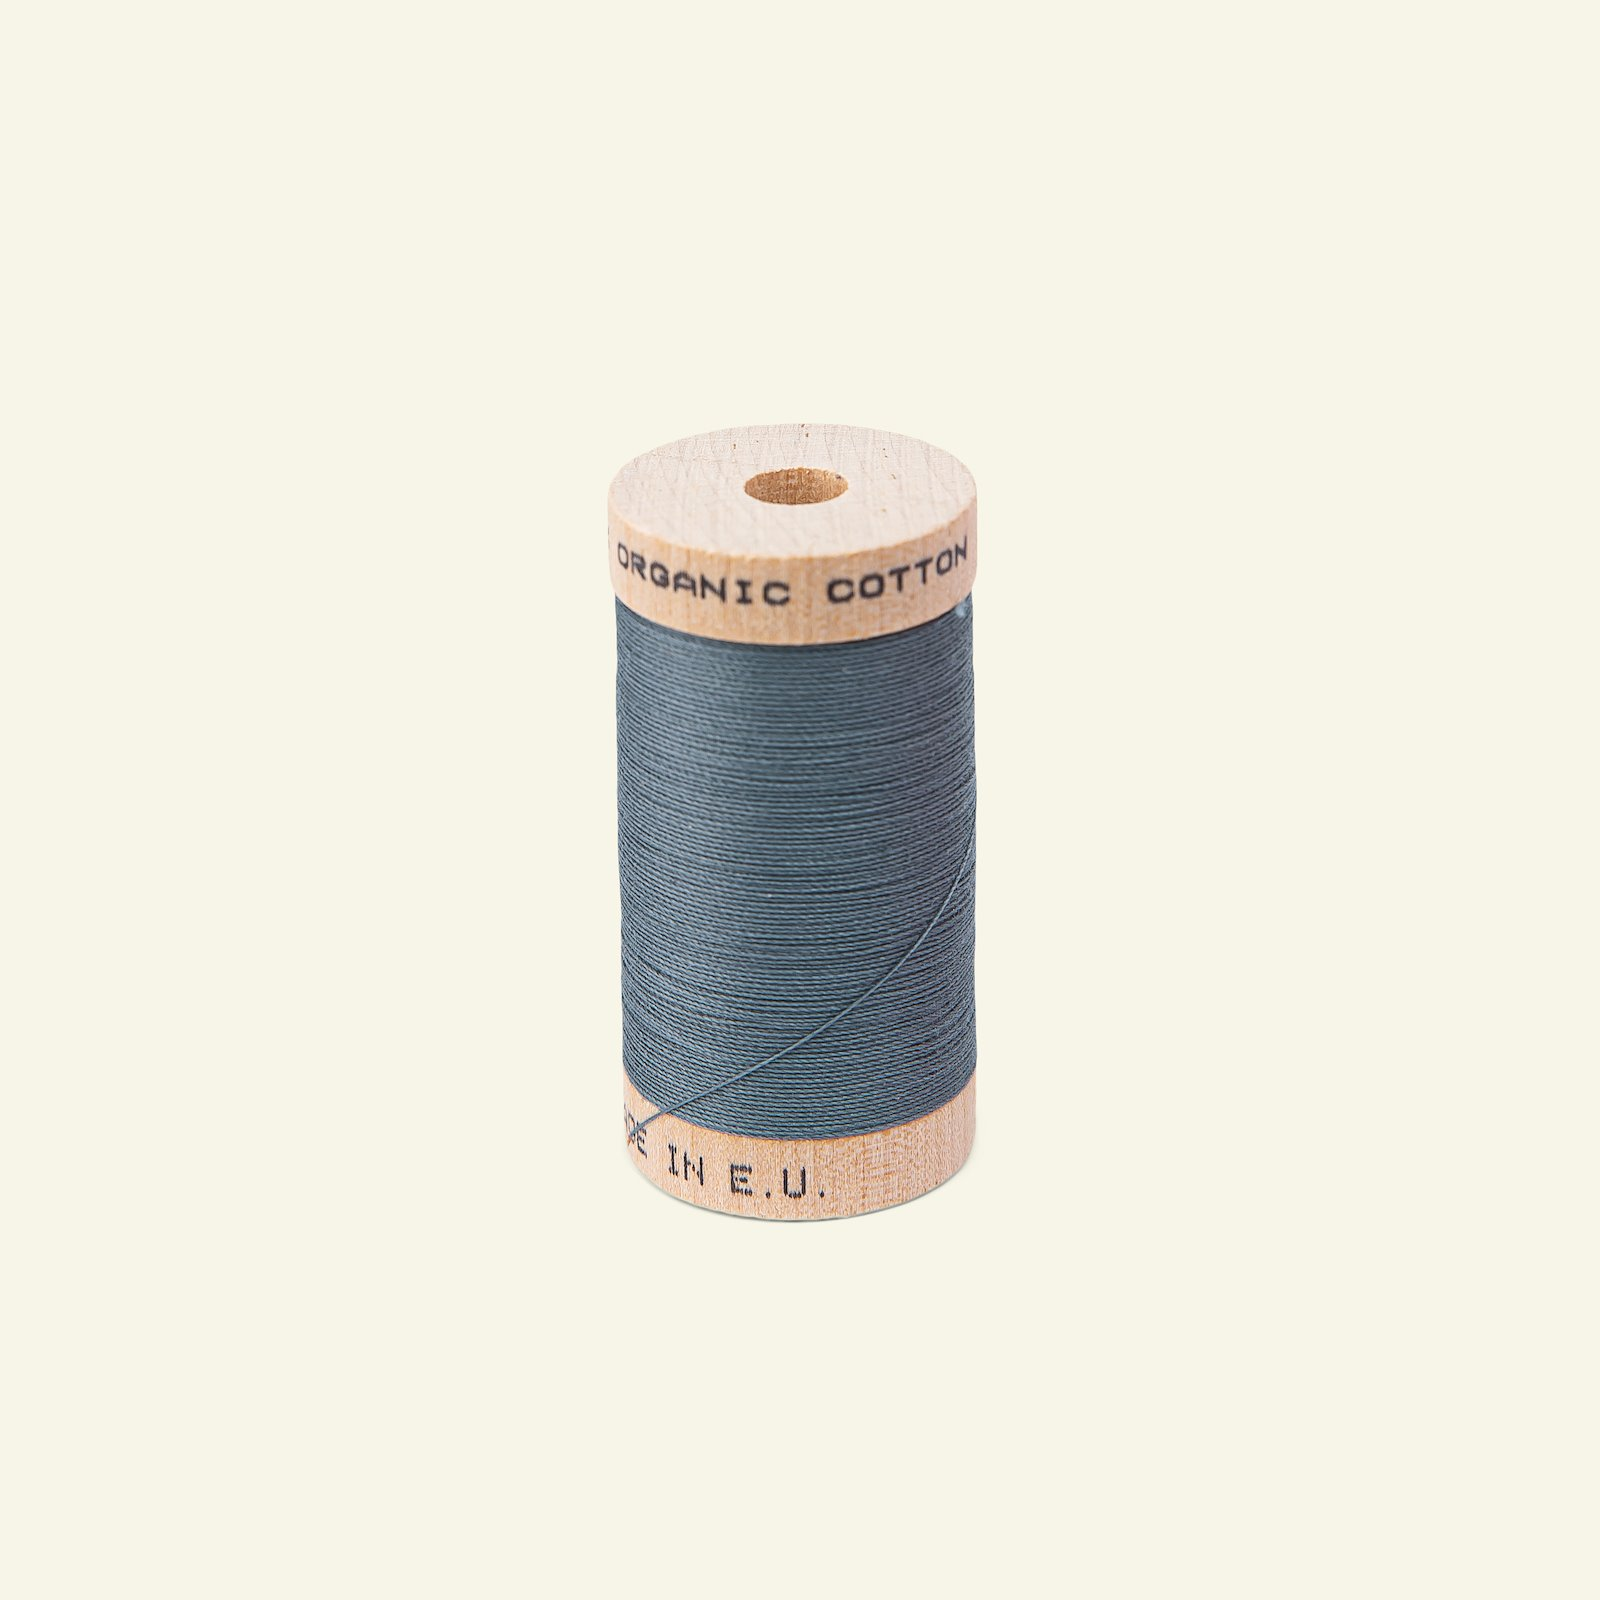 Sewing thread organic cotton blue 100m 18021_pack